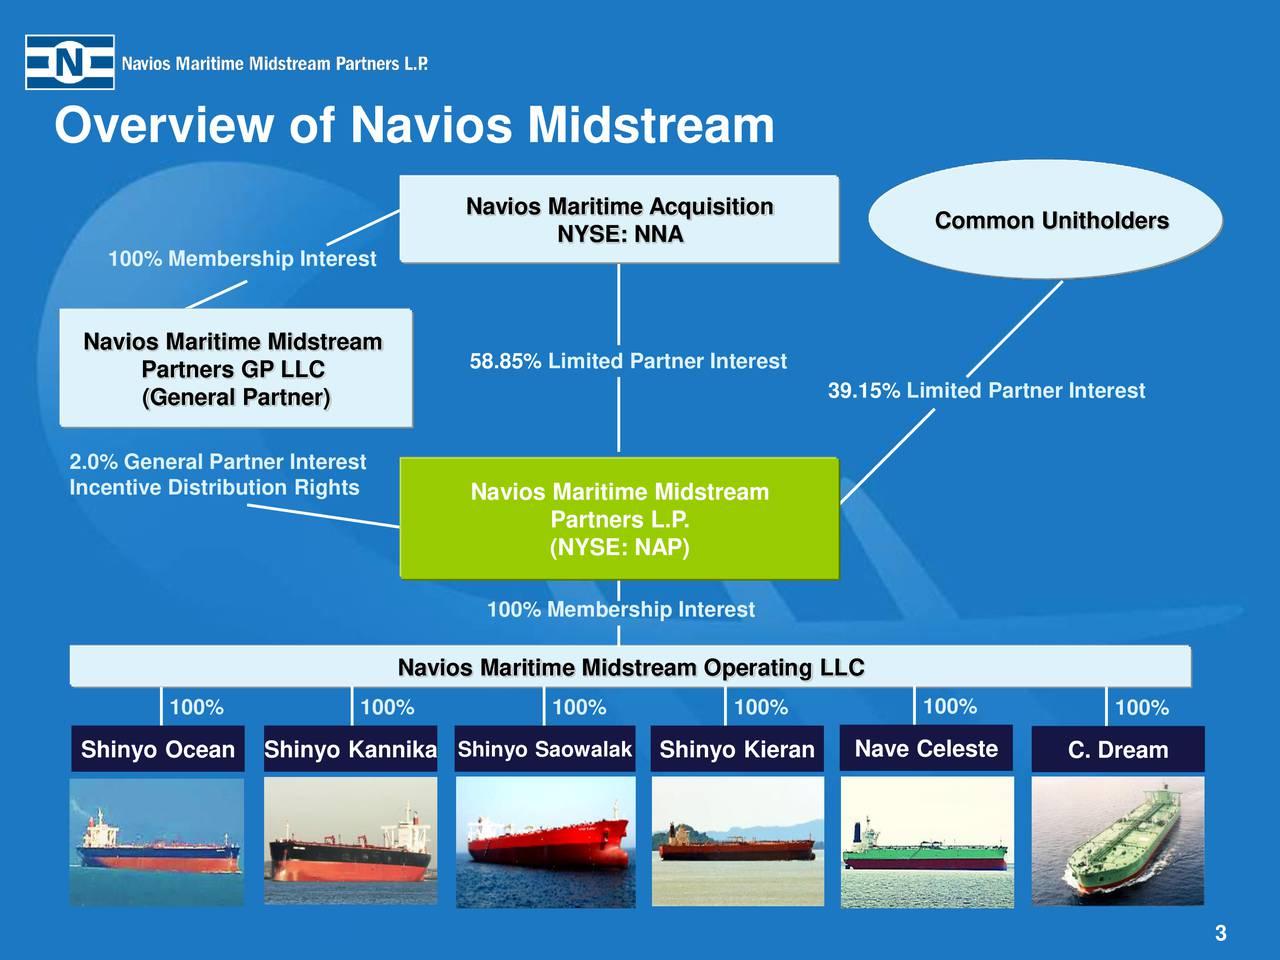 Overview of Navios Midstream Navios Maritime Acquisition Common Unitholders NYSE: NNA 100% Membership Interest Navios Maritime Midstream Partners GP LLC 58.85% Limited Partner Interest (General Partner) 39.15% Limited Partner Interest 2.0% General Partner Interest Incentive Distribution Rights Navios Maritime Midstream Partners L.P. (NYSE: NAP) 100% Membership Interest Navios Maritime Midstream Operating LLC 100% 100% 100% 100% 100% 100% Shinyo Ocean Shinyo Kannika Shinyo Saowalak Shinyo Kieran Nave Celeste C. Dream 3